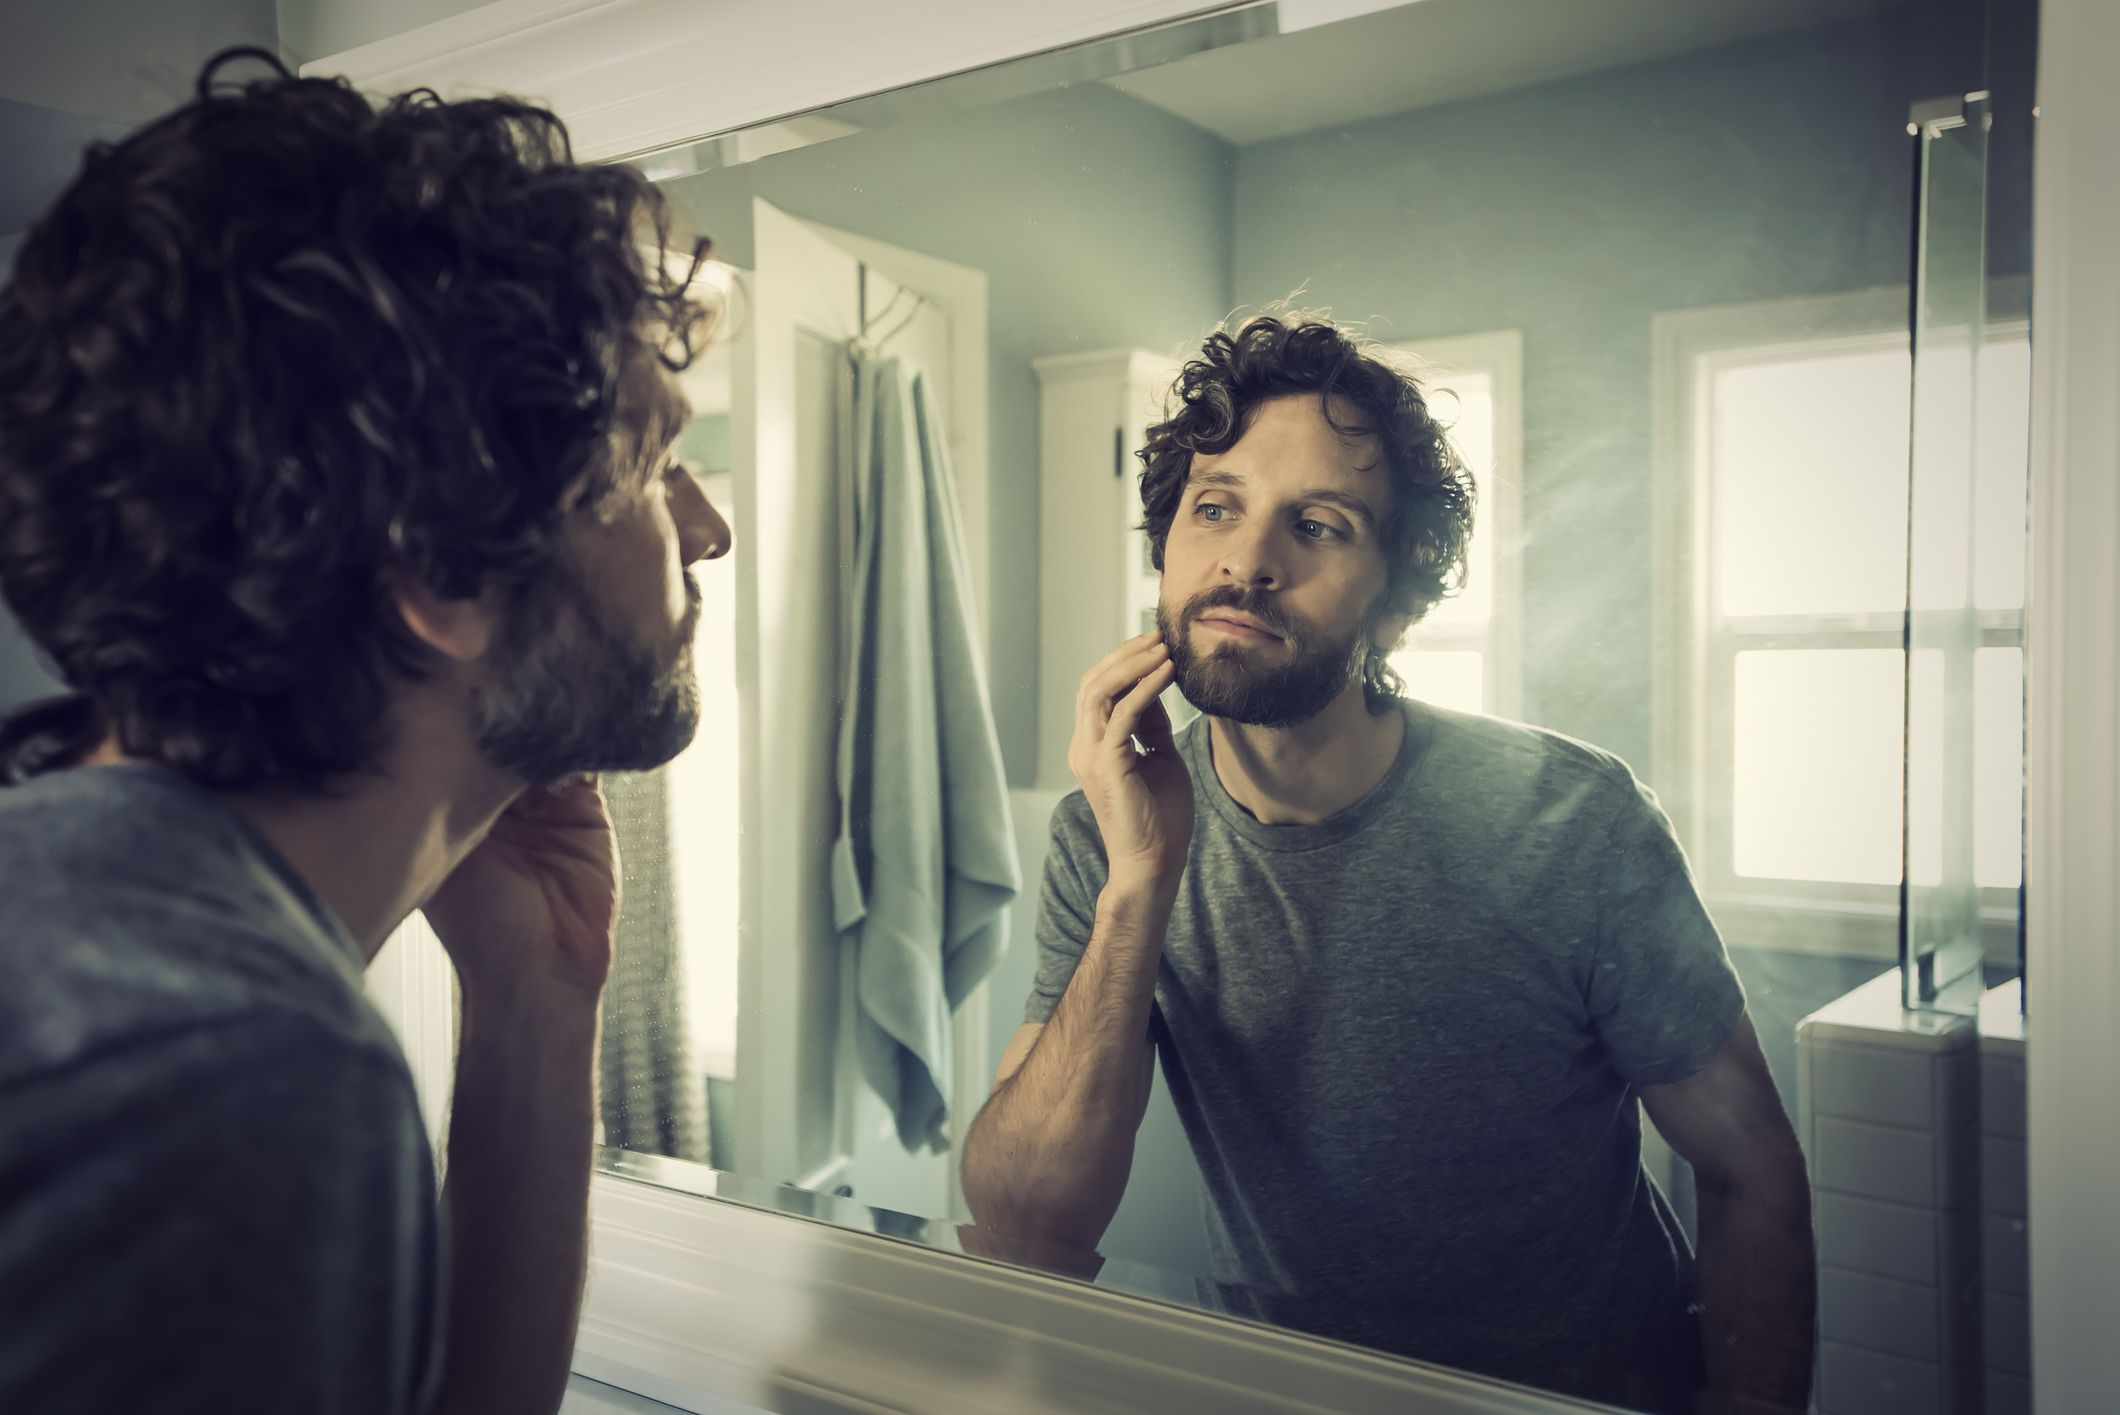 A Grooming Expert's Three-Step Plan to Mask Sleep Loss